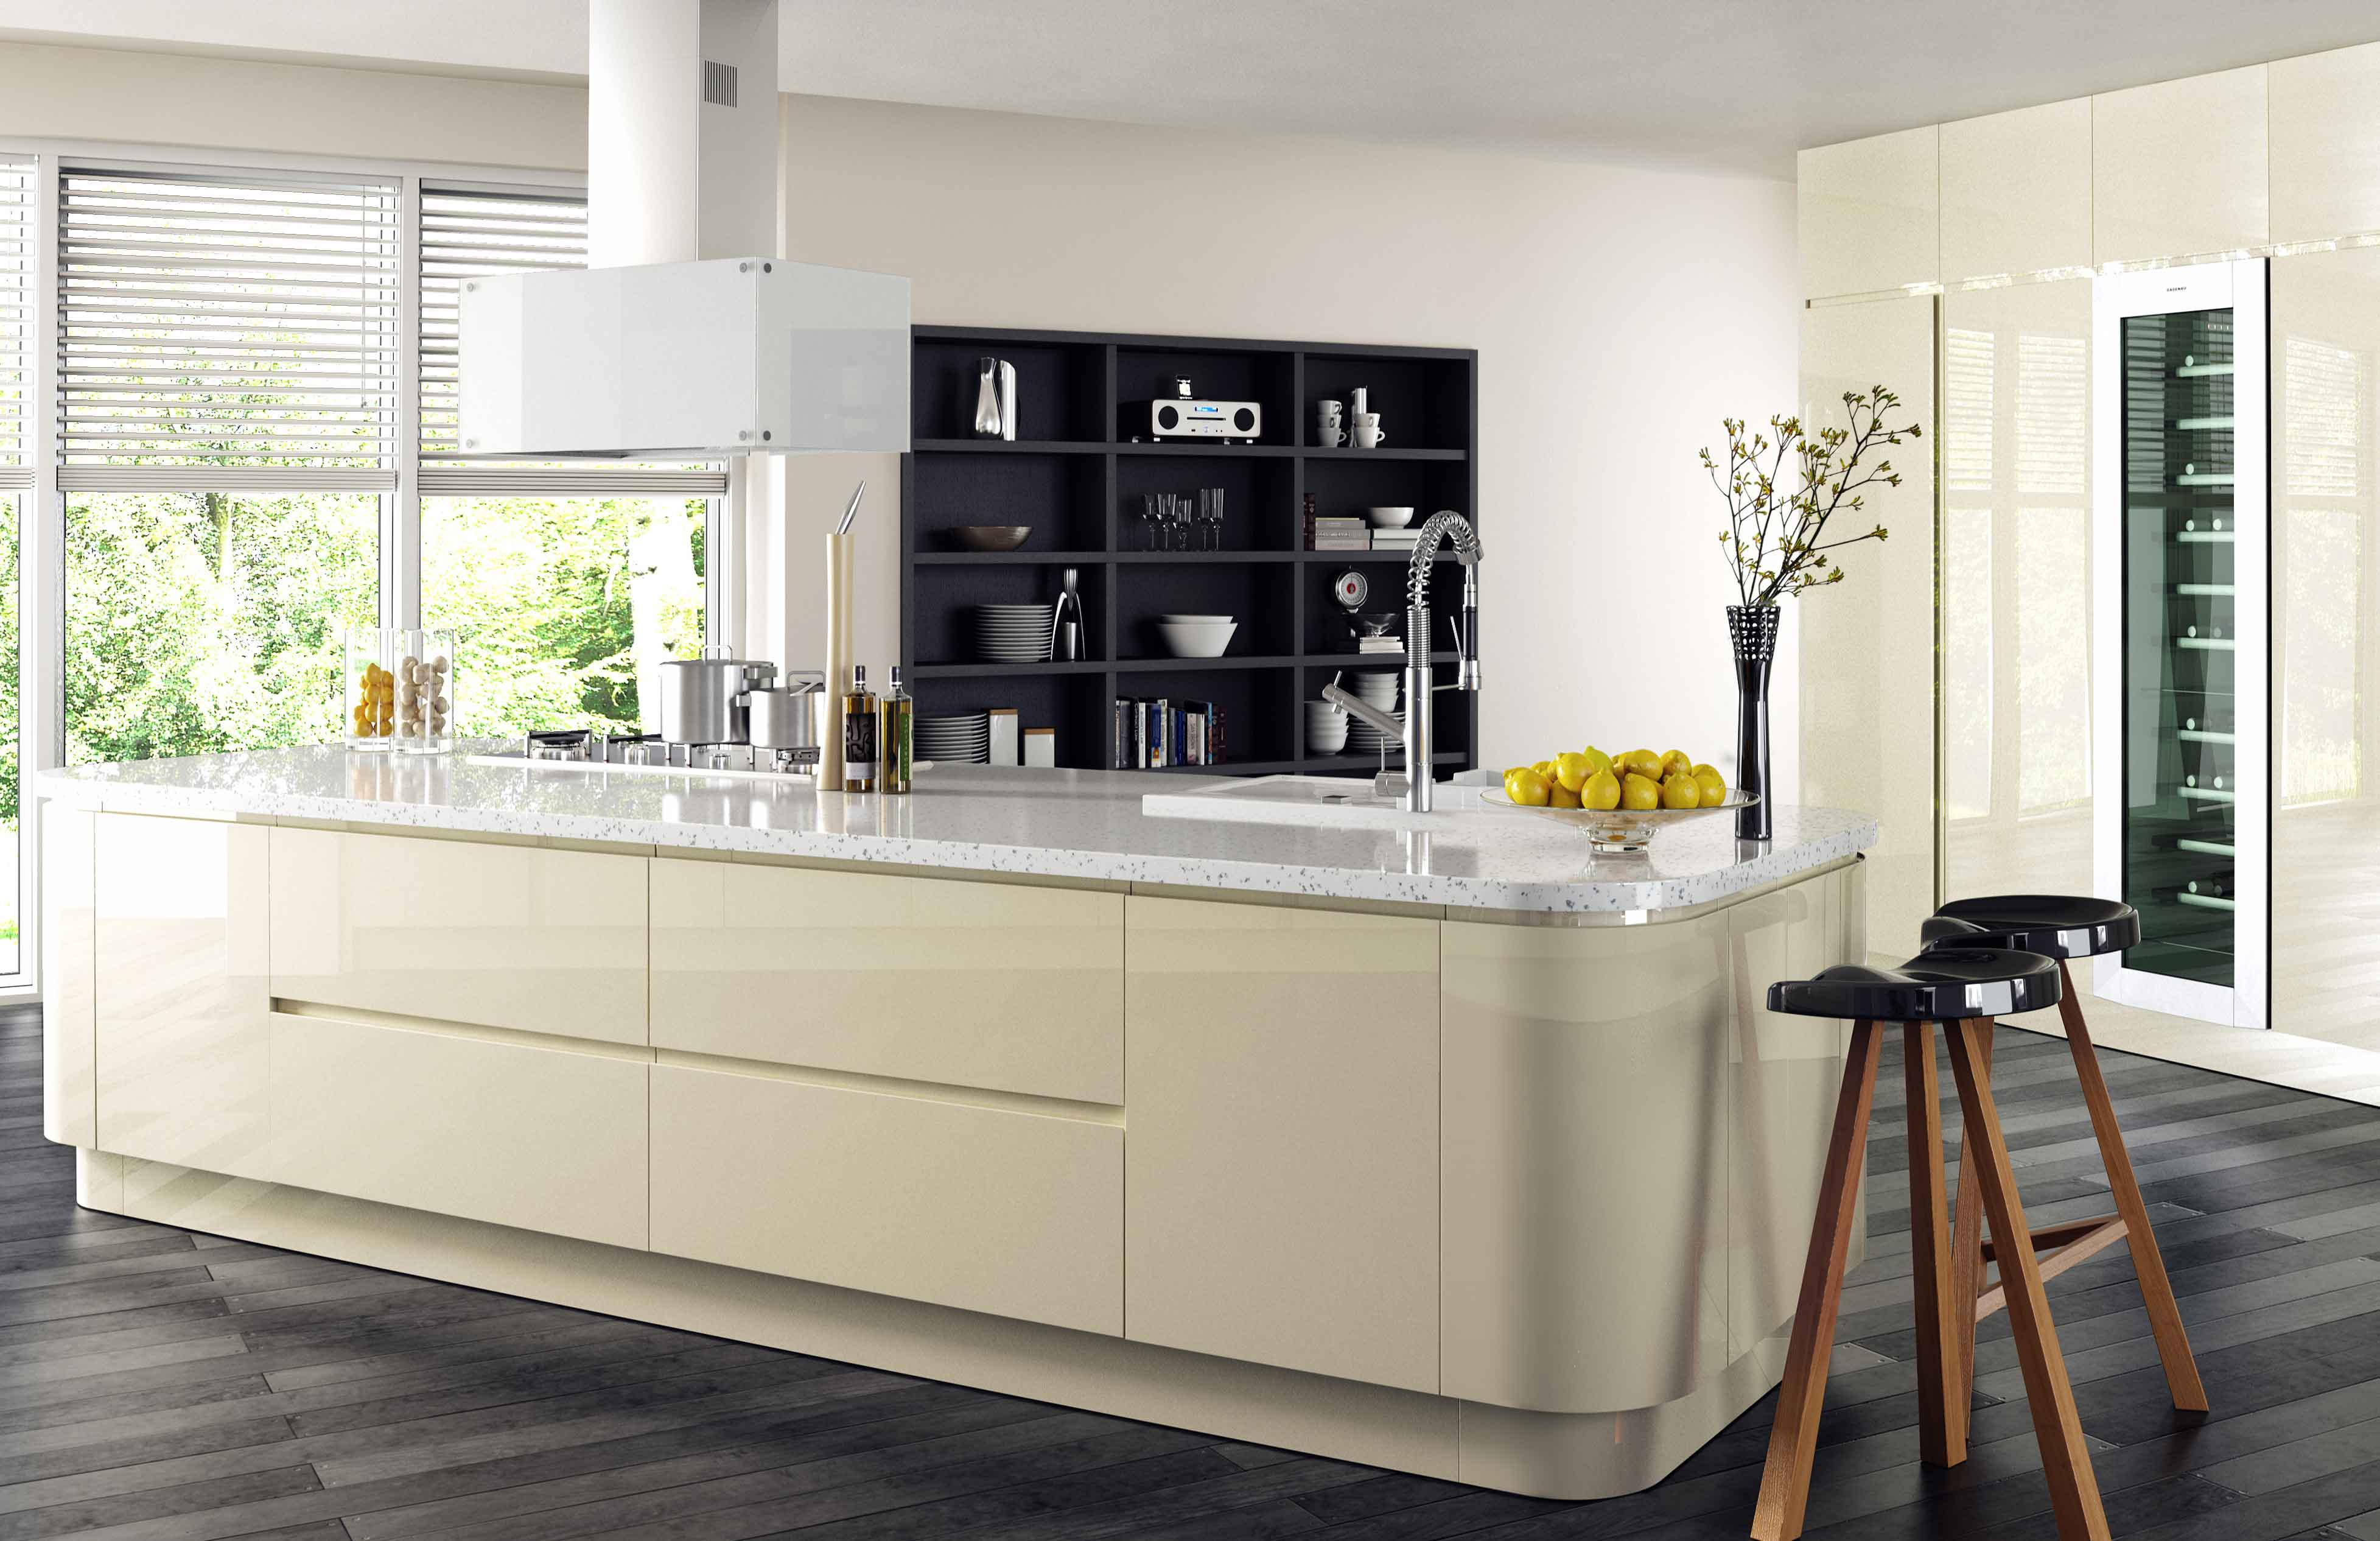 Leicester Kitchen Appliances